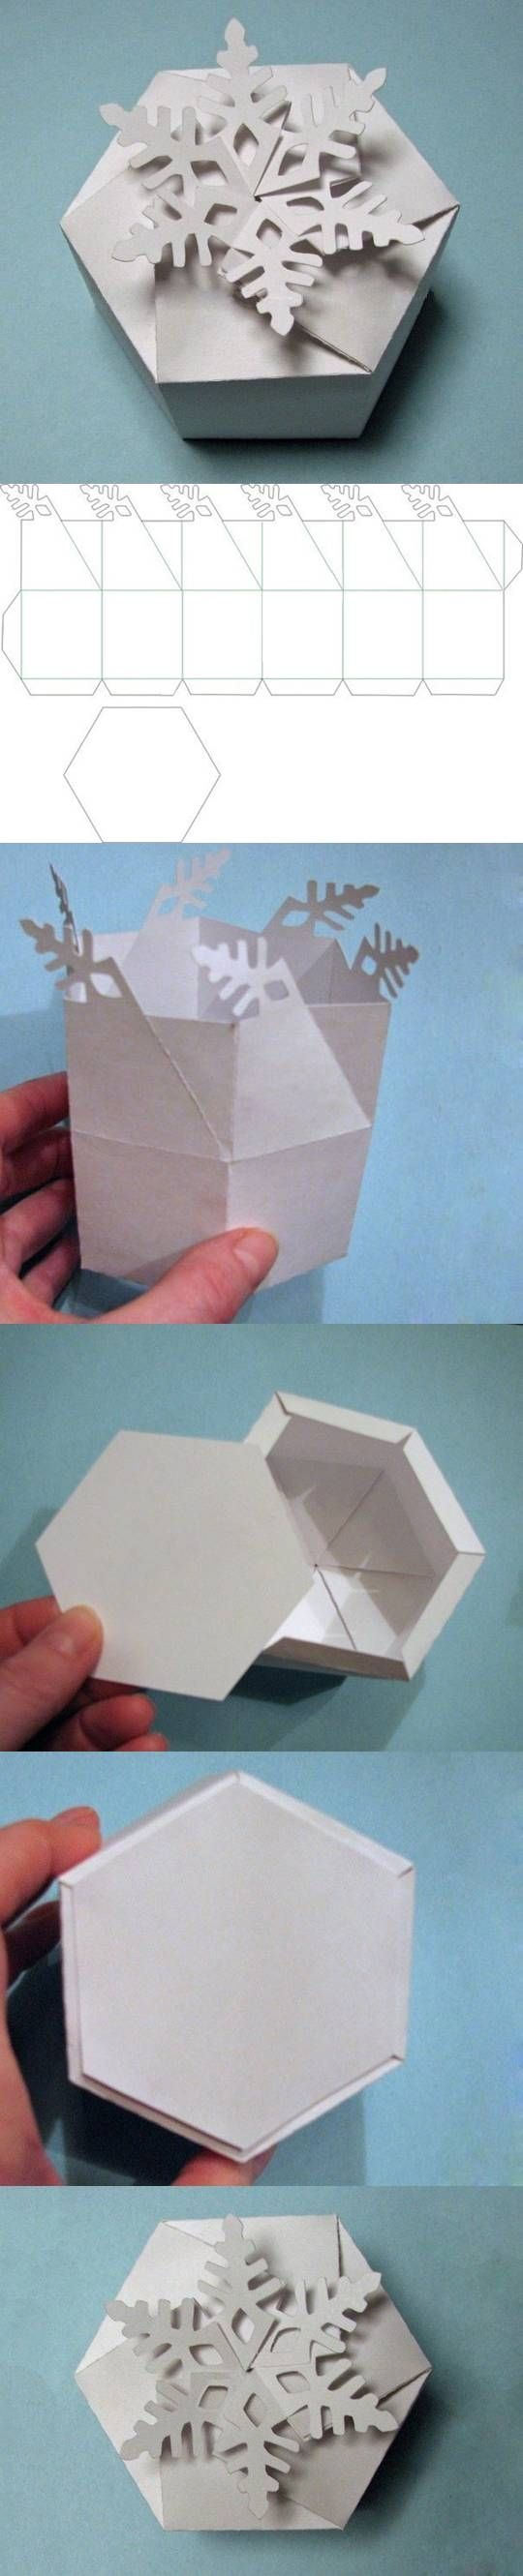 DIY Snowflake Gift Box